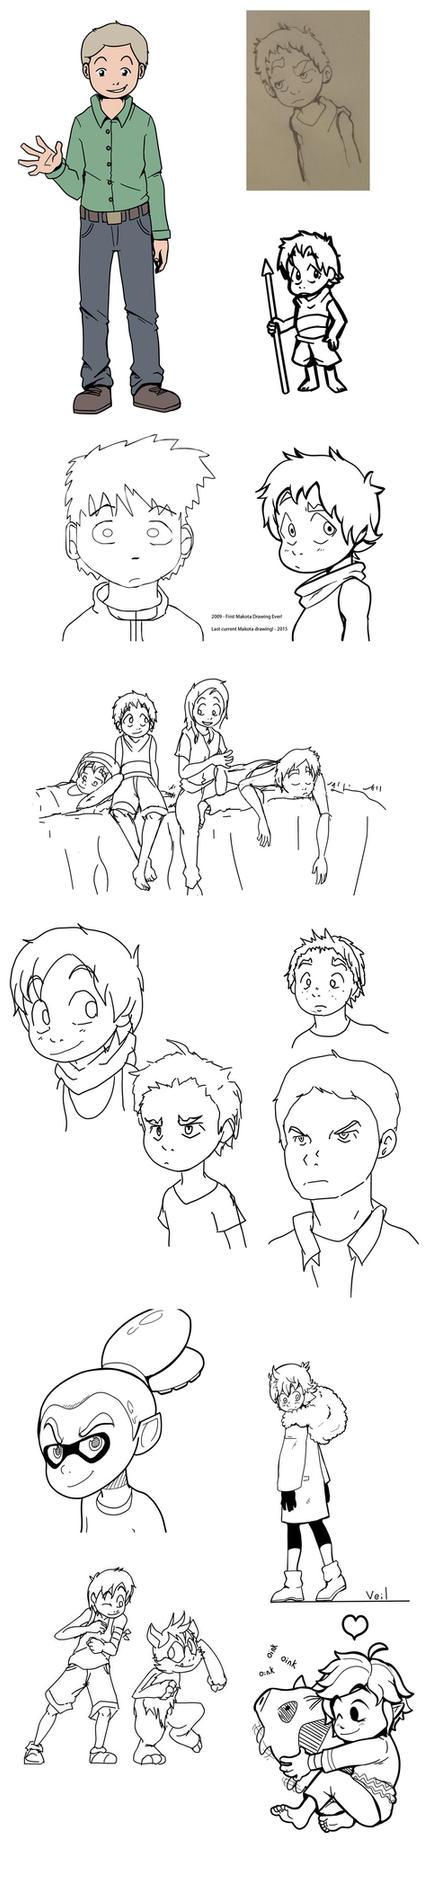 Sketch Dump 22! The Twitterz by Parimak